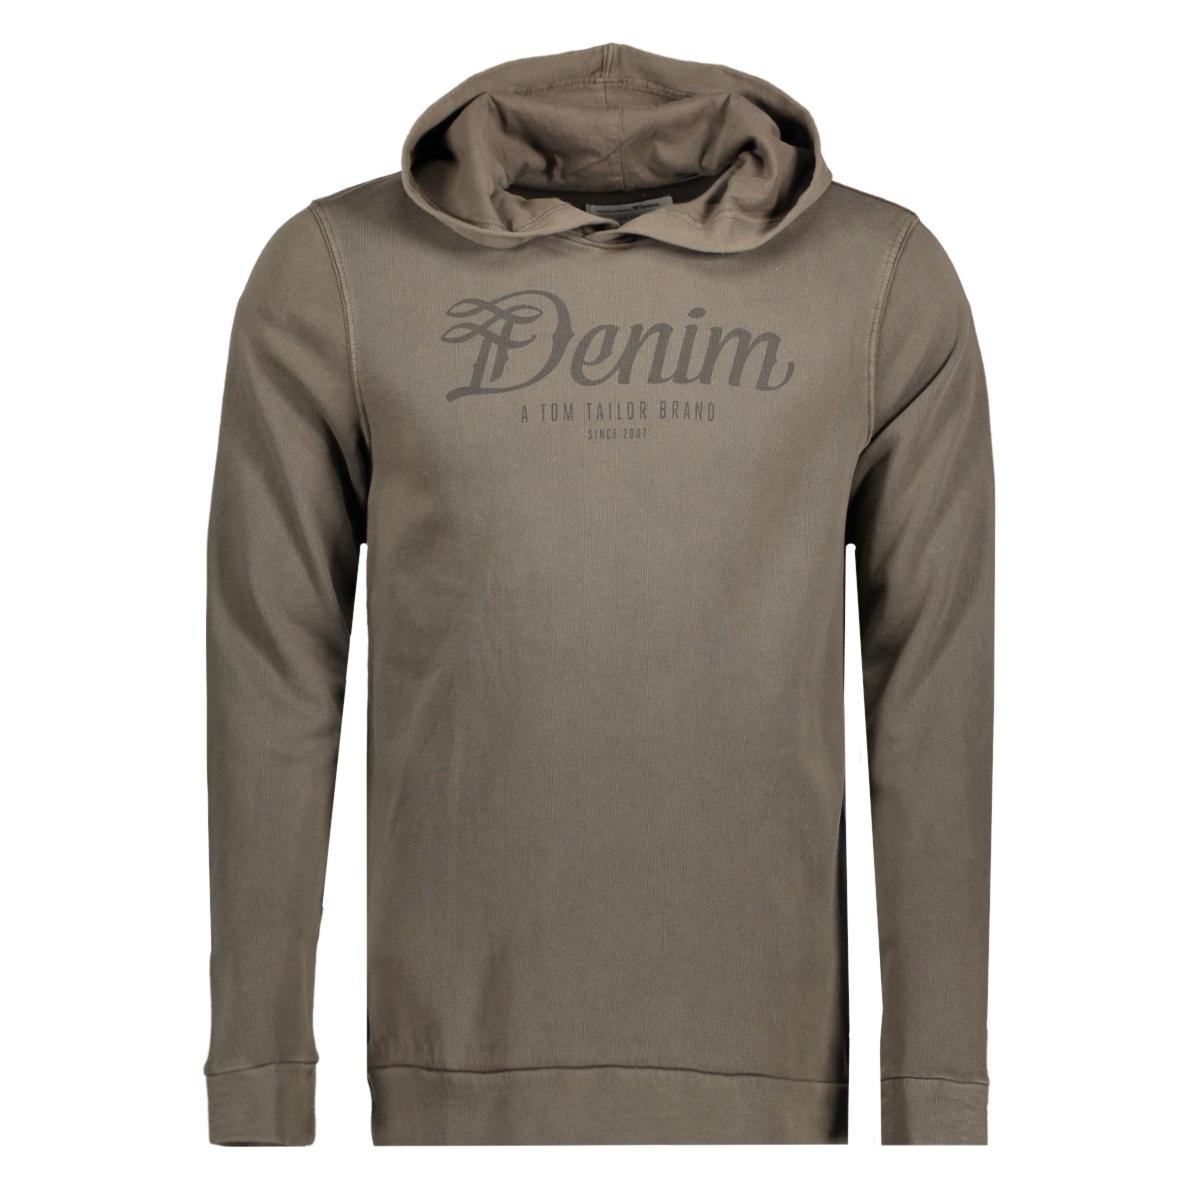 2555136.00.12 tom tailor sweater 7807